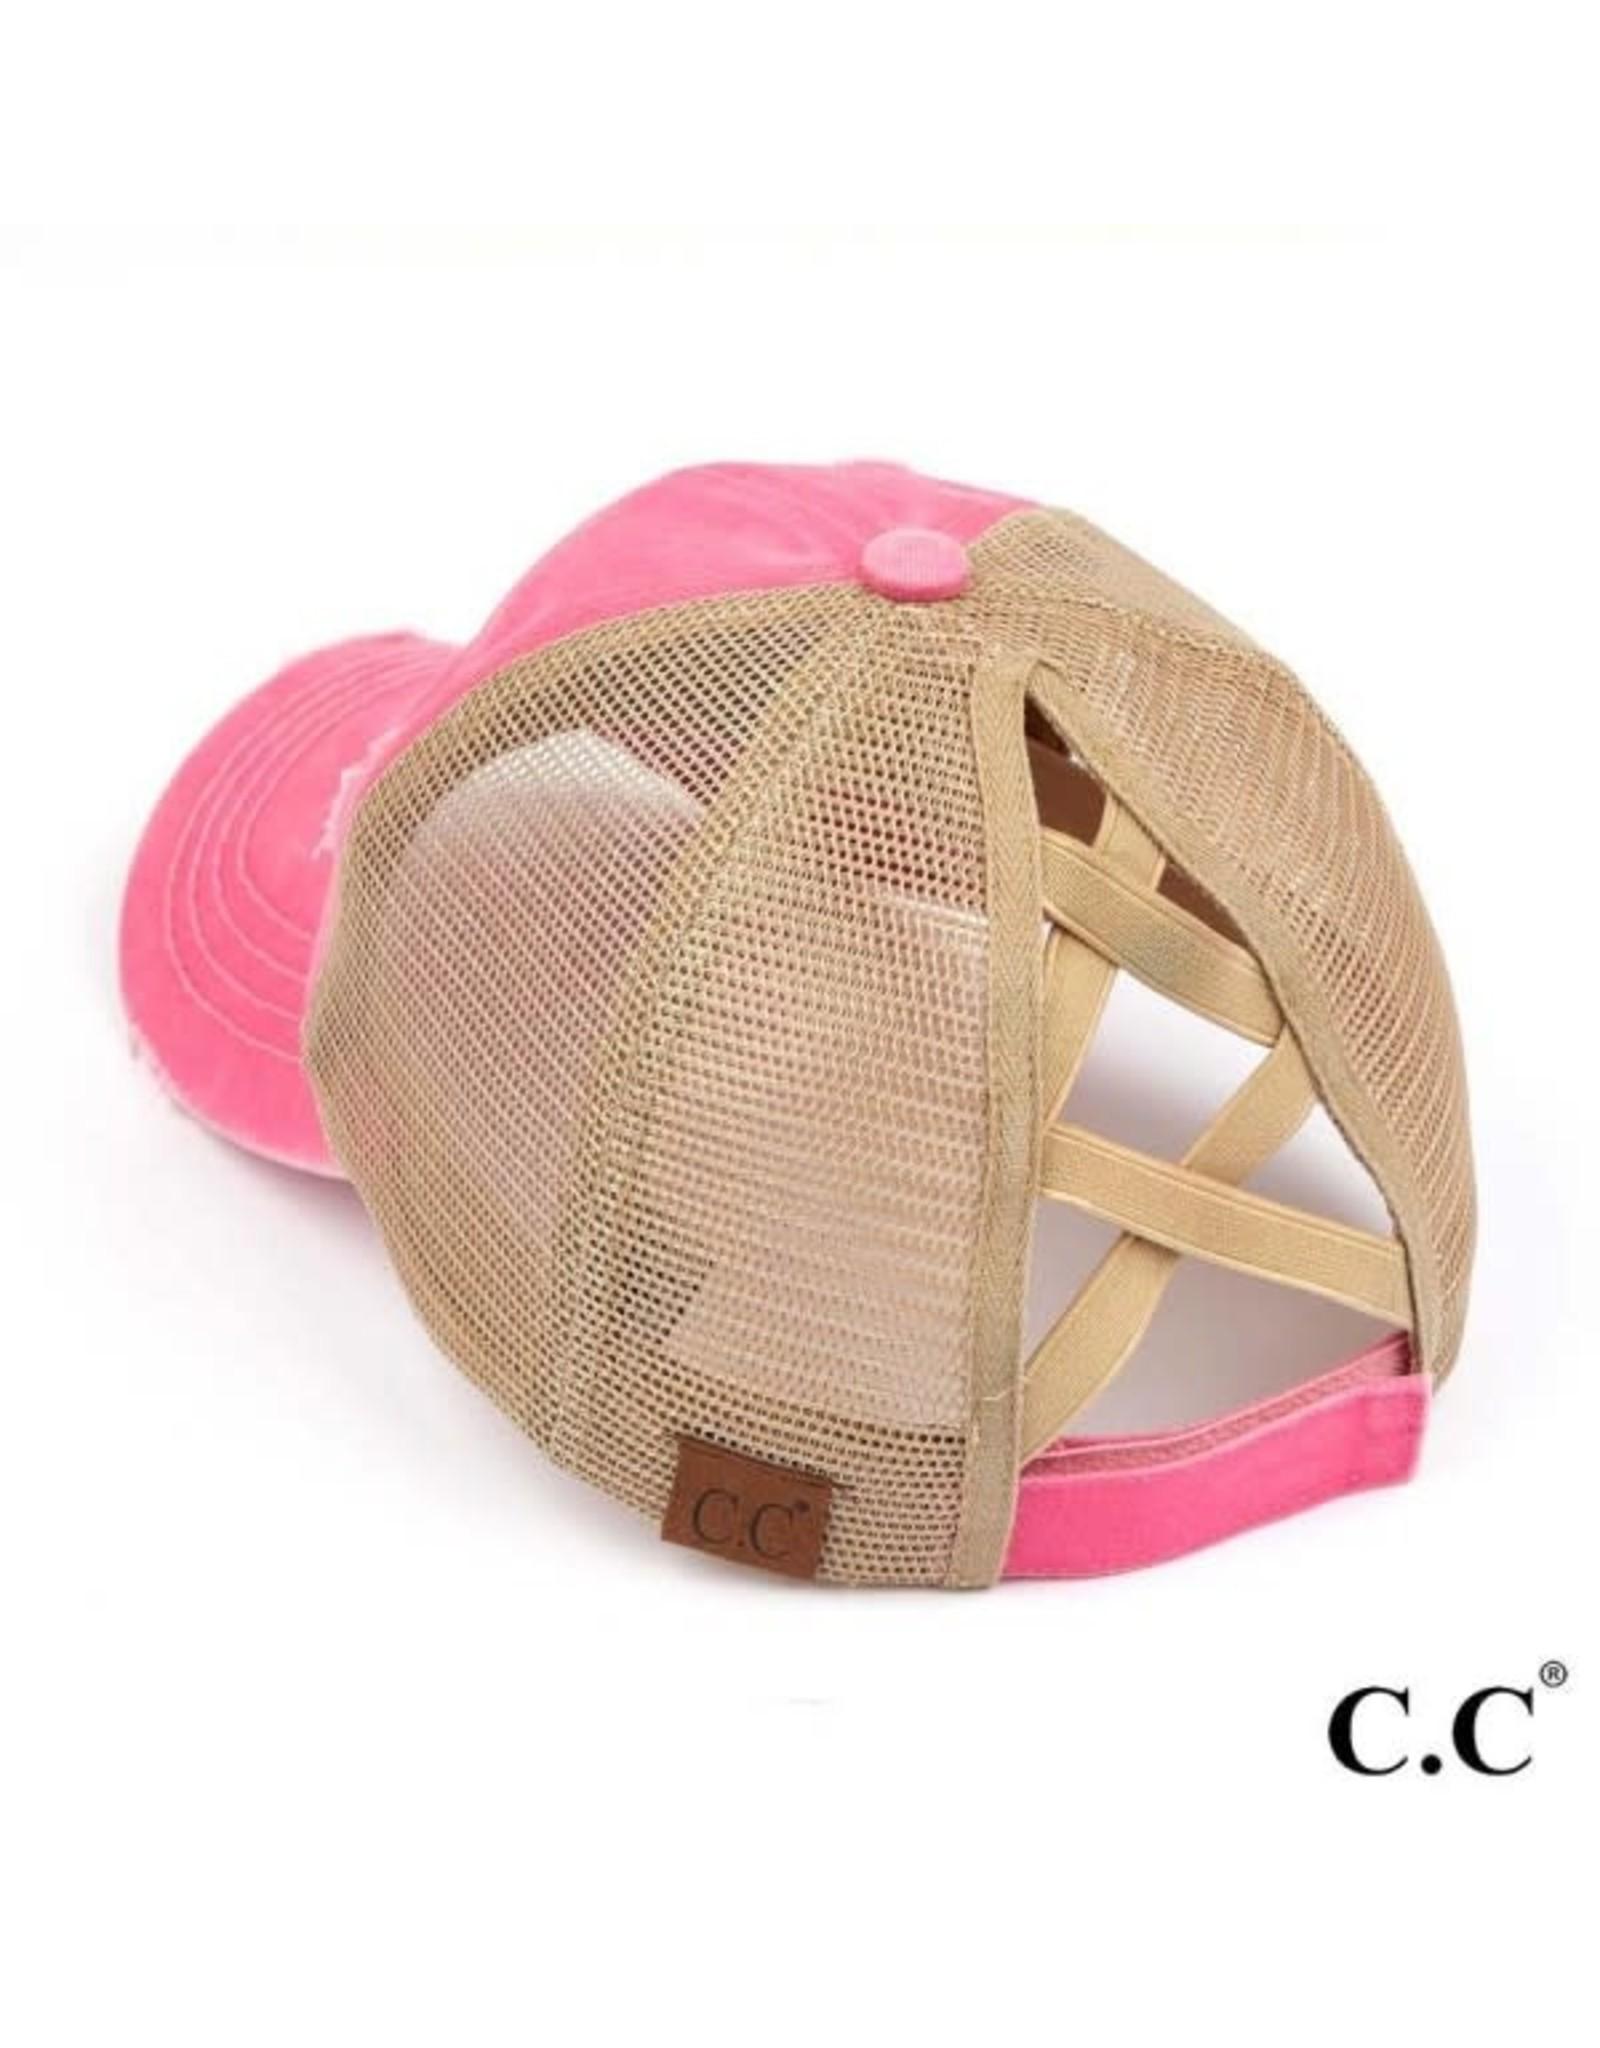 Distressed Pink & Tan Hat